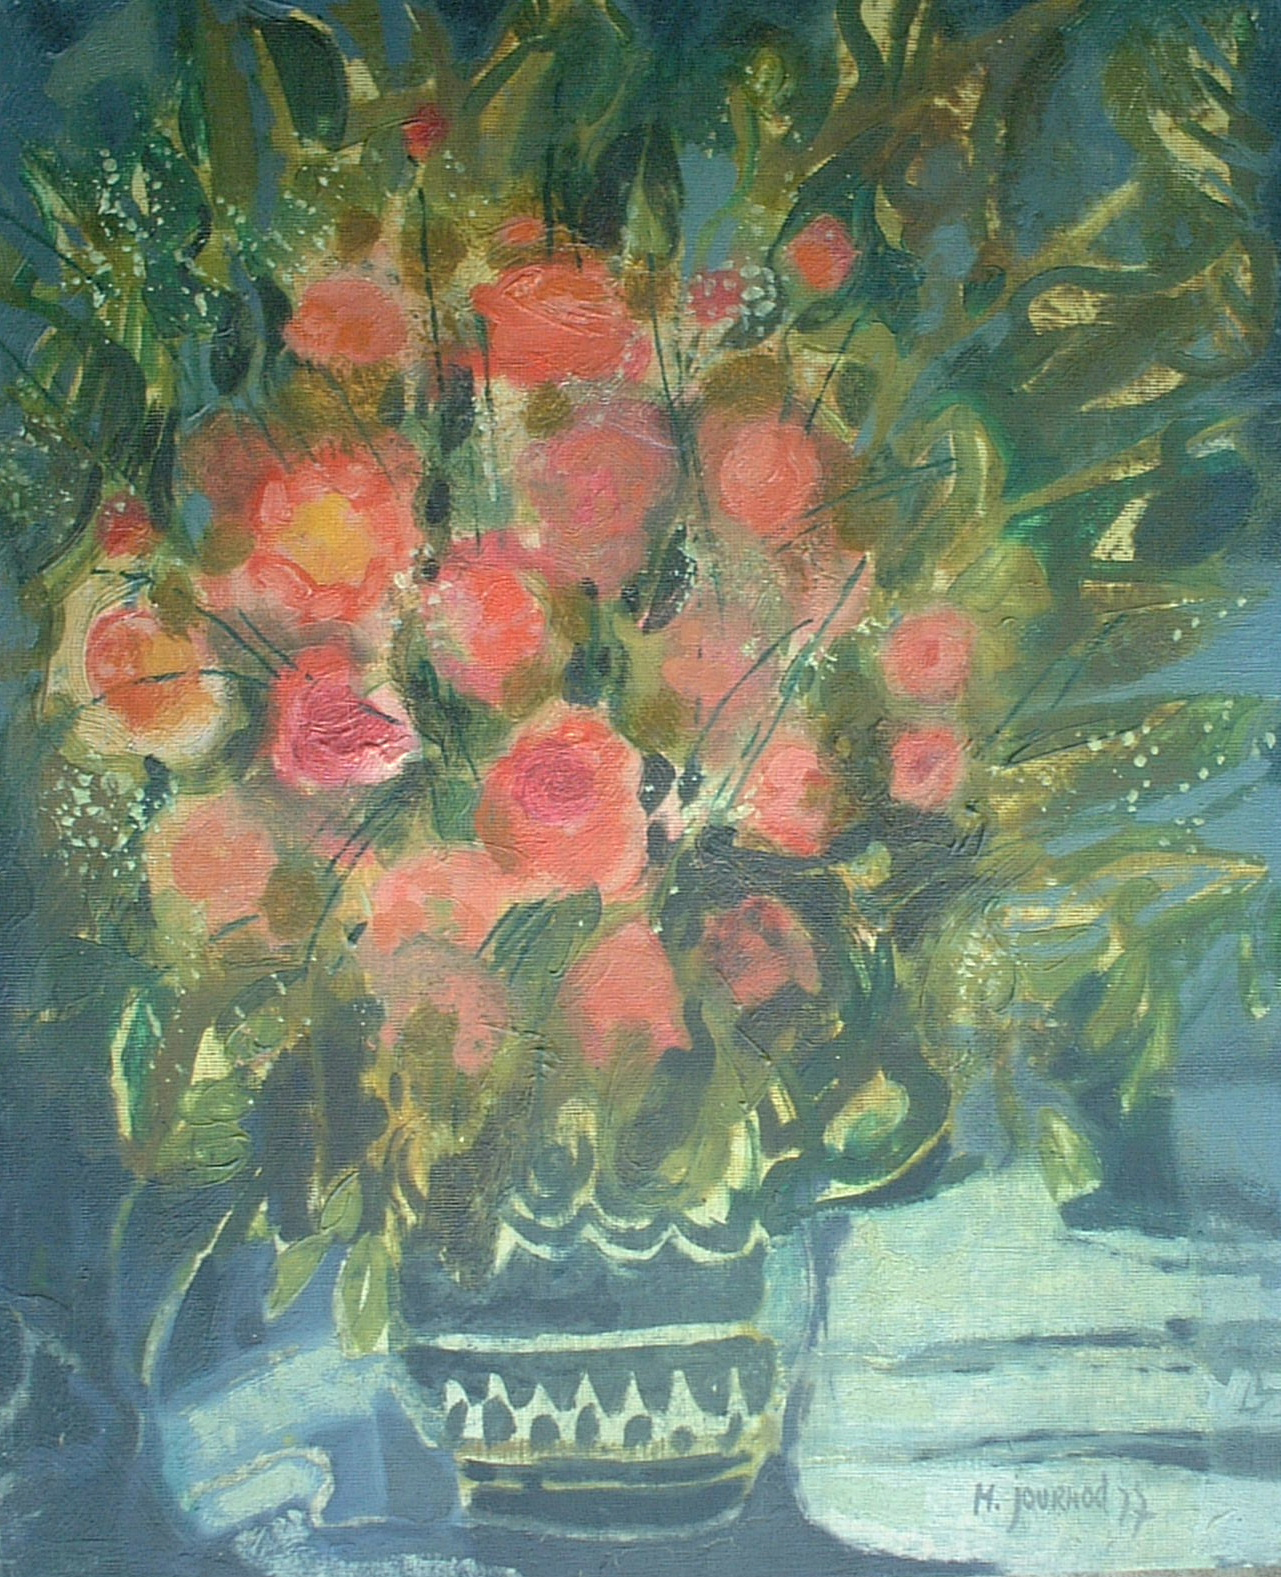 Artist: M Journod Title: Spring Bouquet Size: 18in x 15in Framed: No